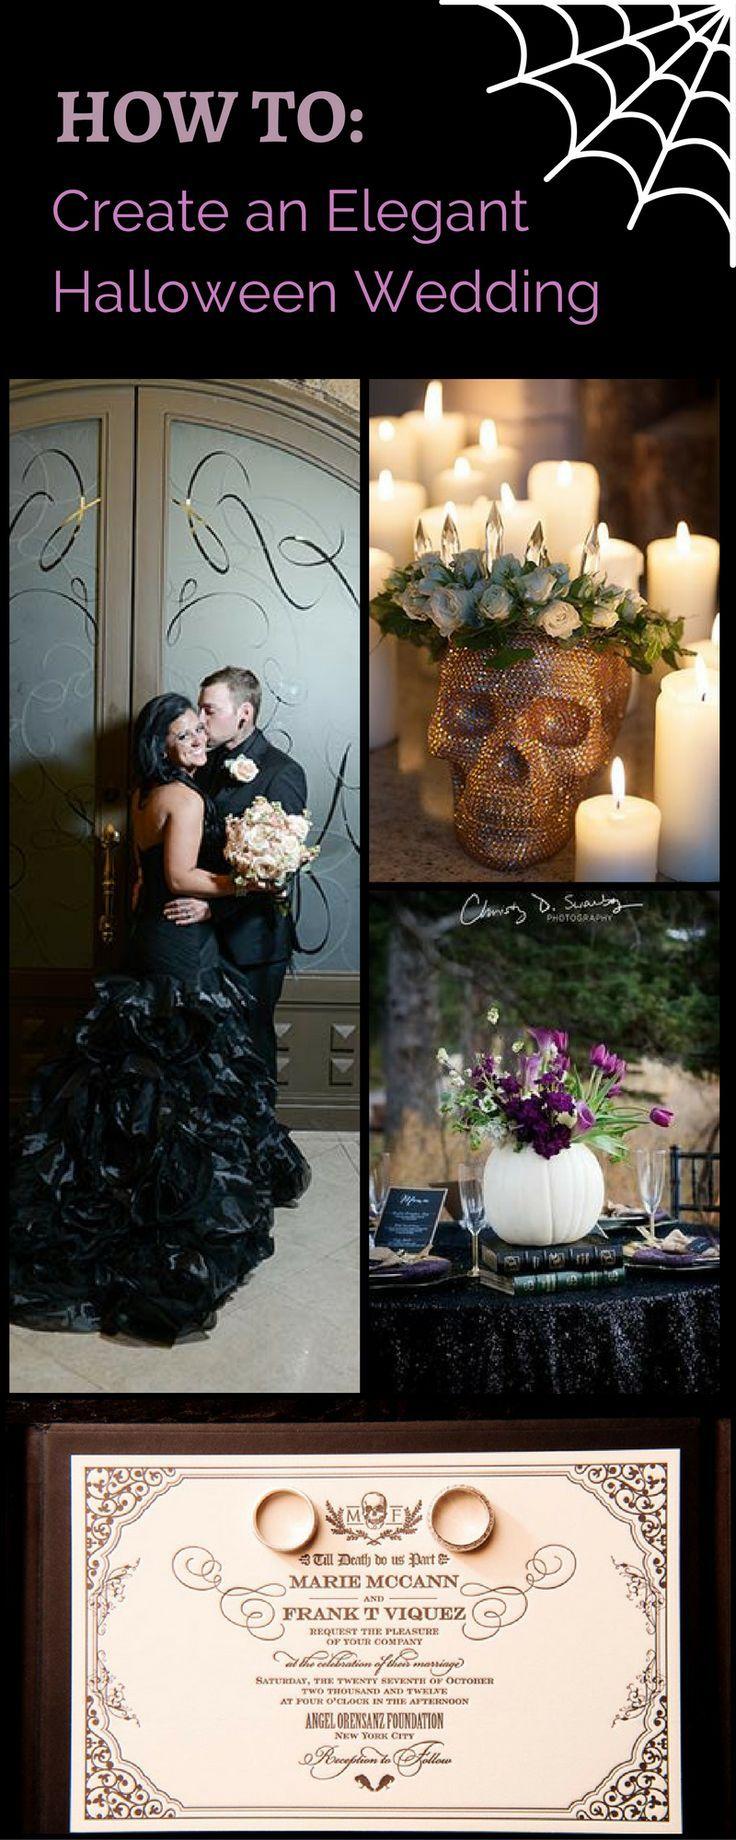 Ways to make your Halloween Wedding elegant and classy. Romantic gothic inspired weddings